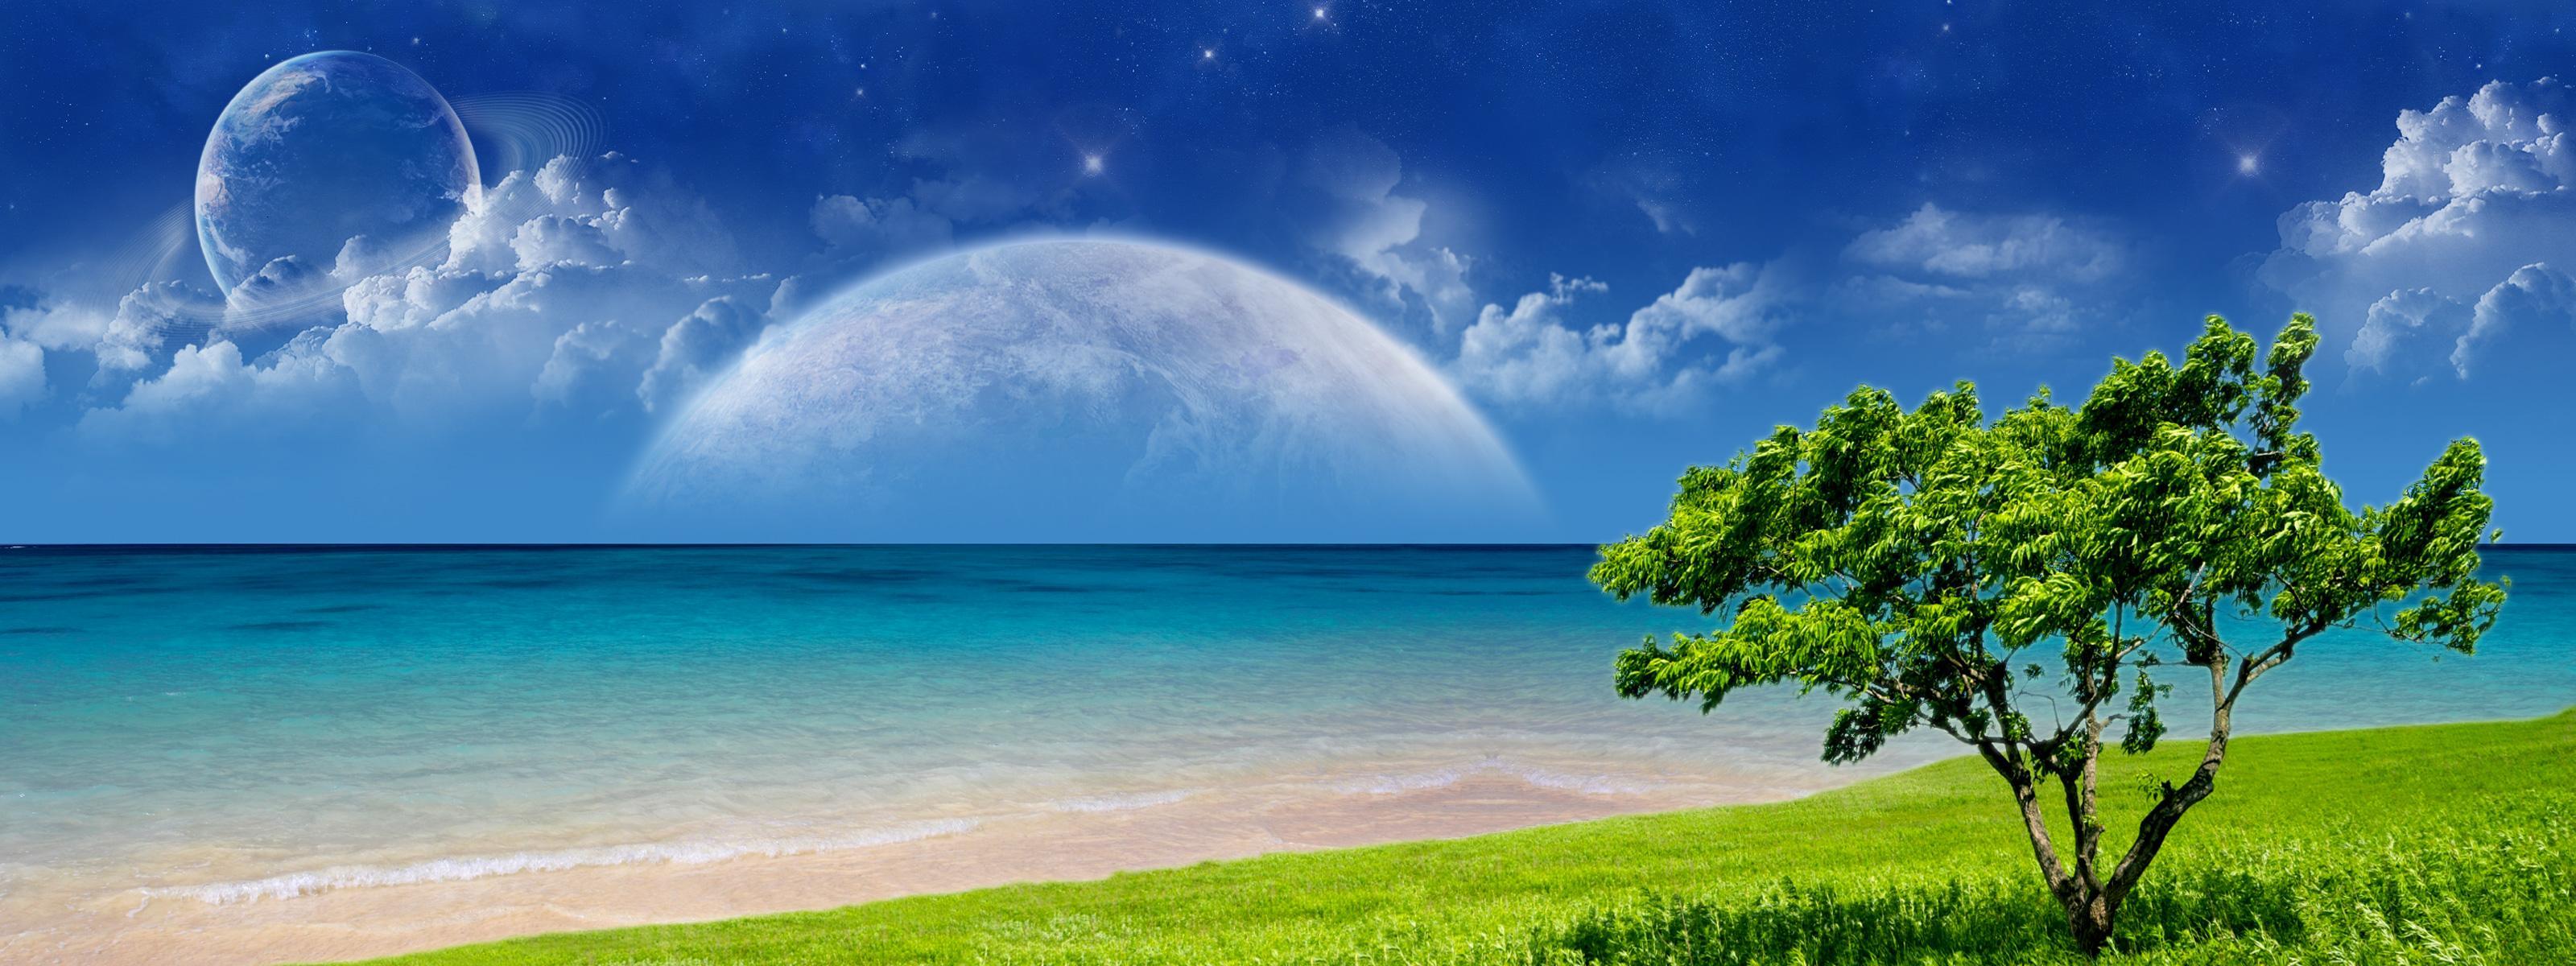 Multi Monitor Dual Screen cg digital art manip ocean sea sky planets 3200x1200